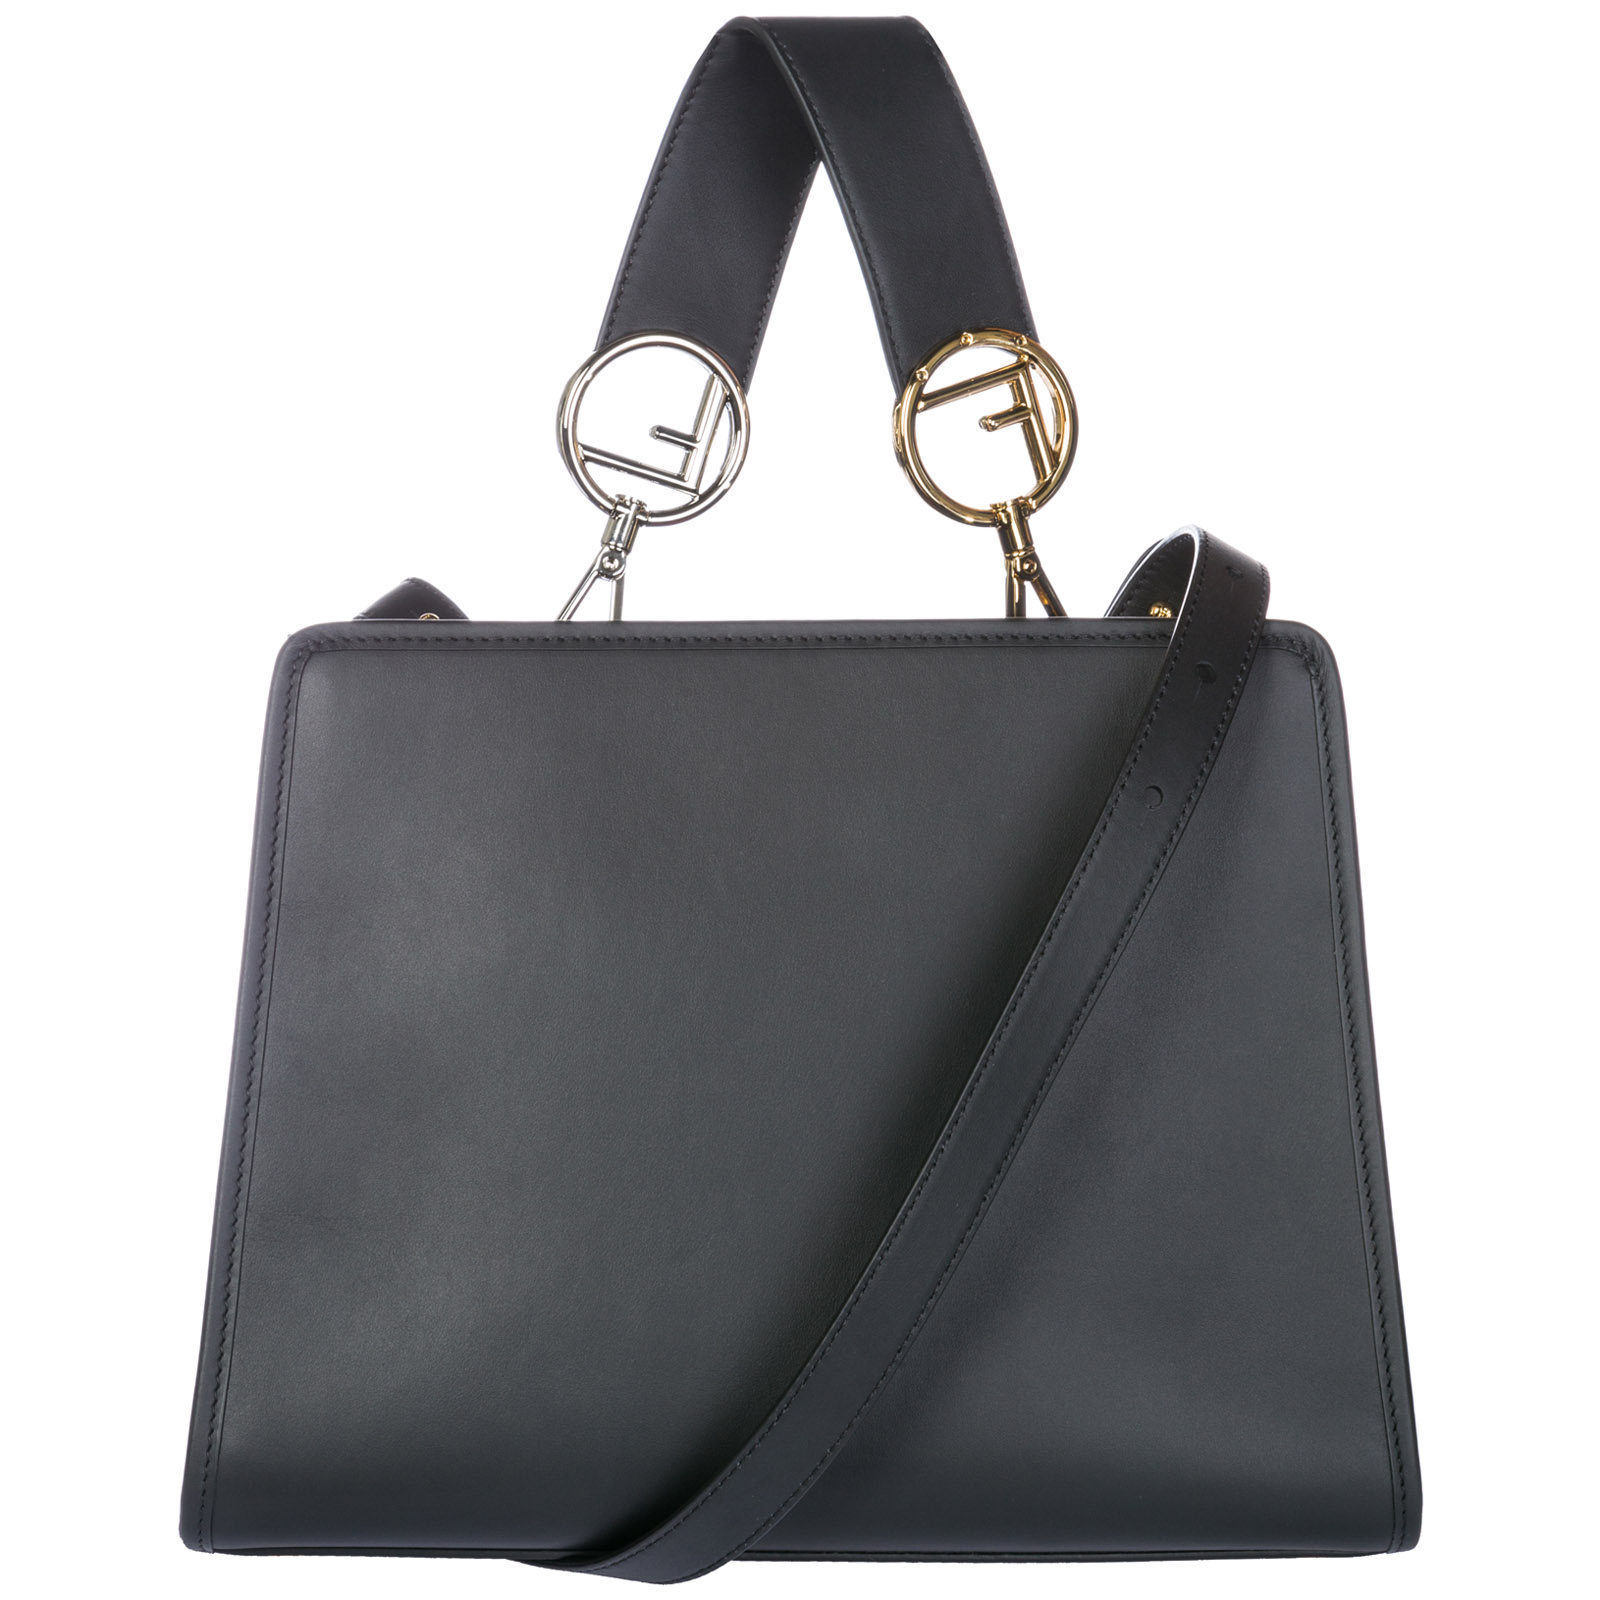 Fendi Women s handbag shopping bag purse tote in pelle runaway small 0cdad013c0